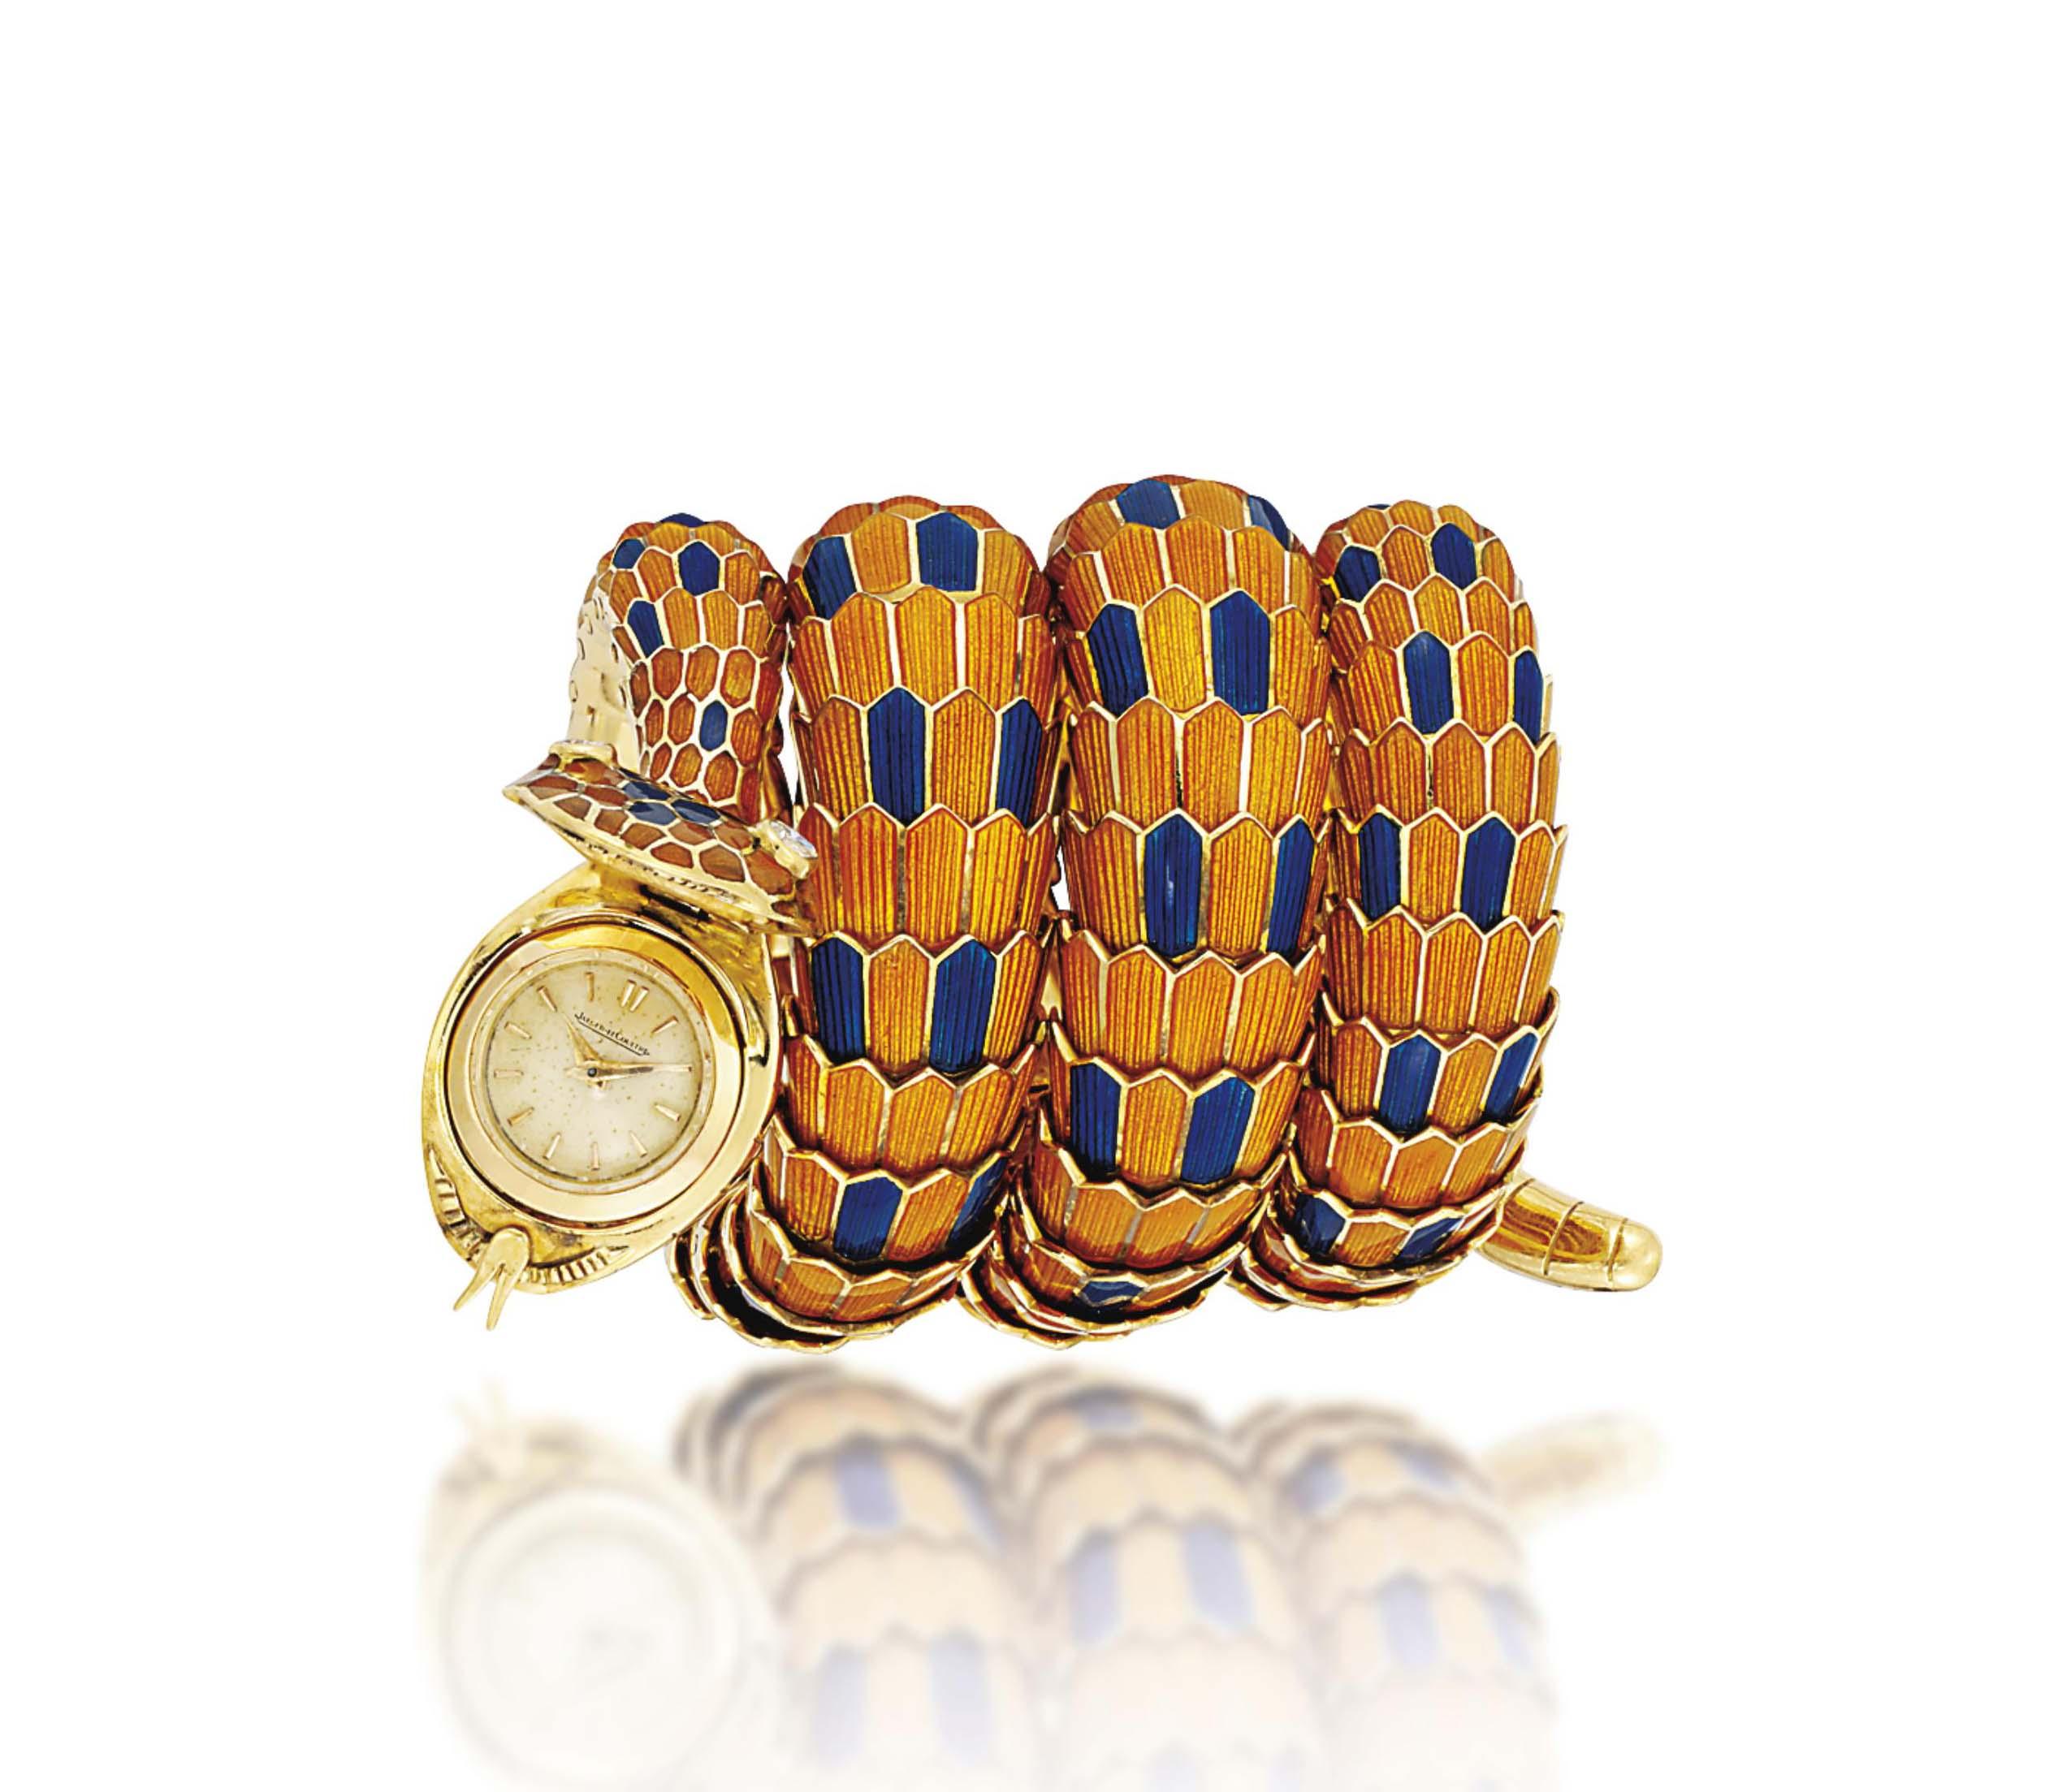 A RARE ENAMEL AND DIAMOND SNAKE WRISTWATCH, BY BULGARI